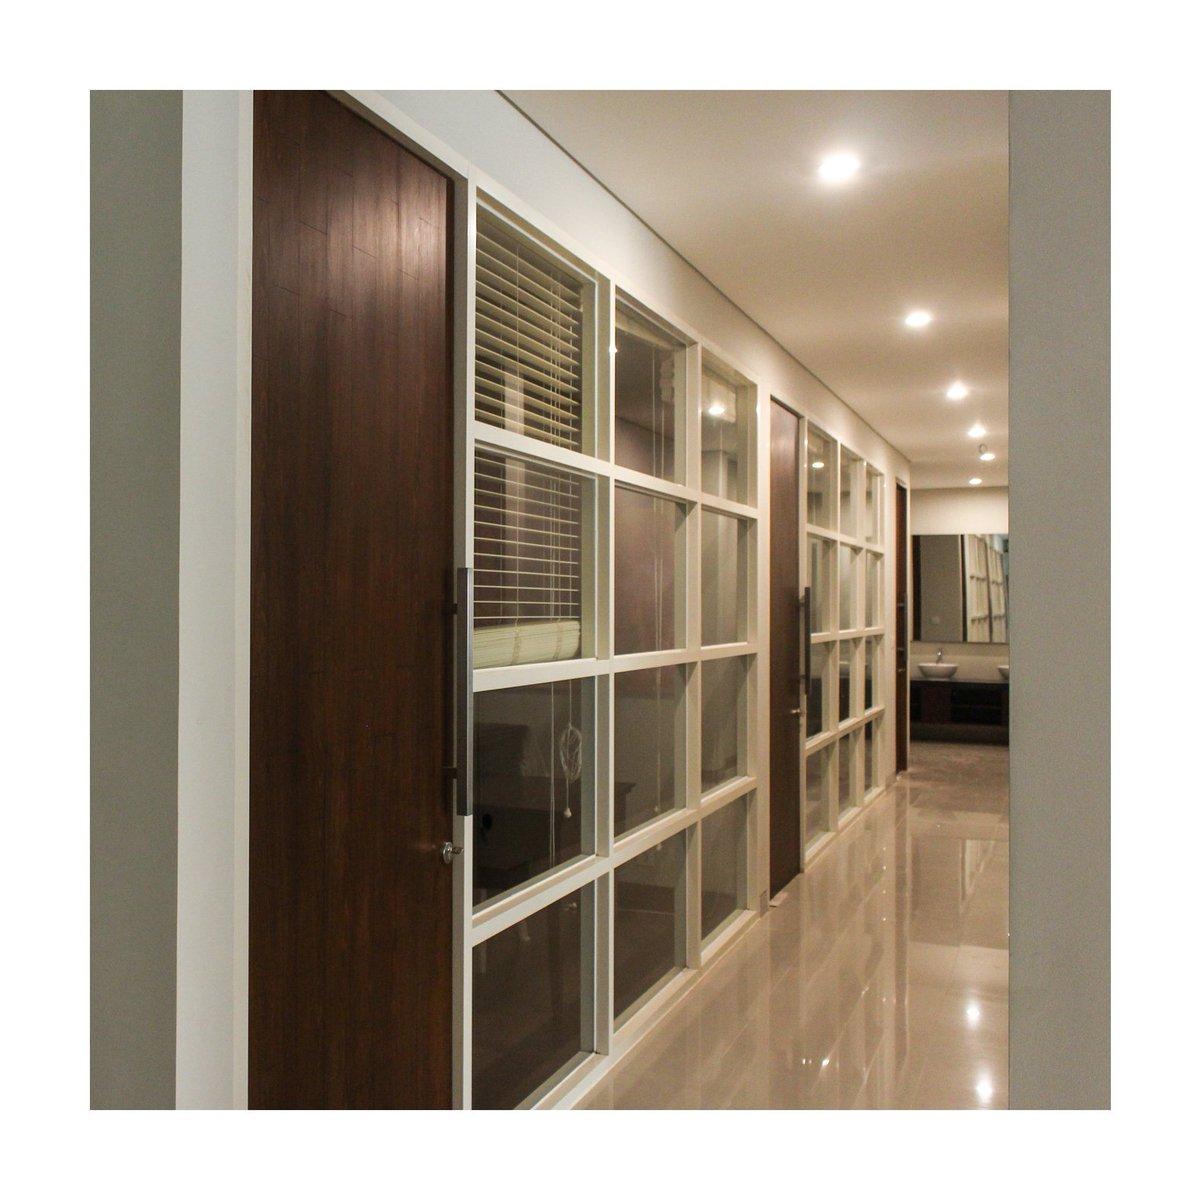 Home Interior Architecture Design Building Interiordesign Interiorbali Architectureproduction Homeimprovement Tropical Office Door Window